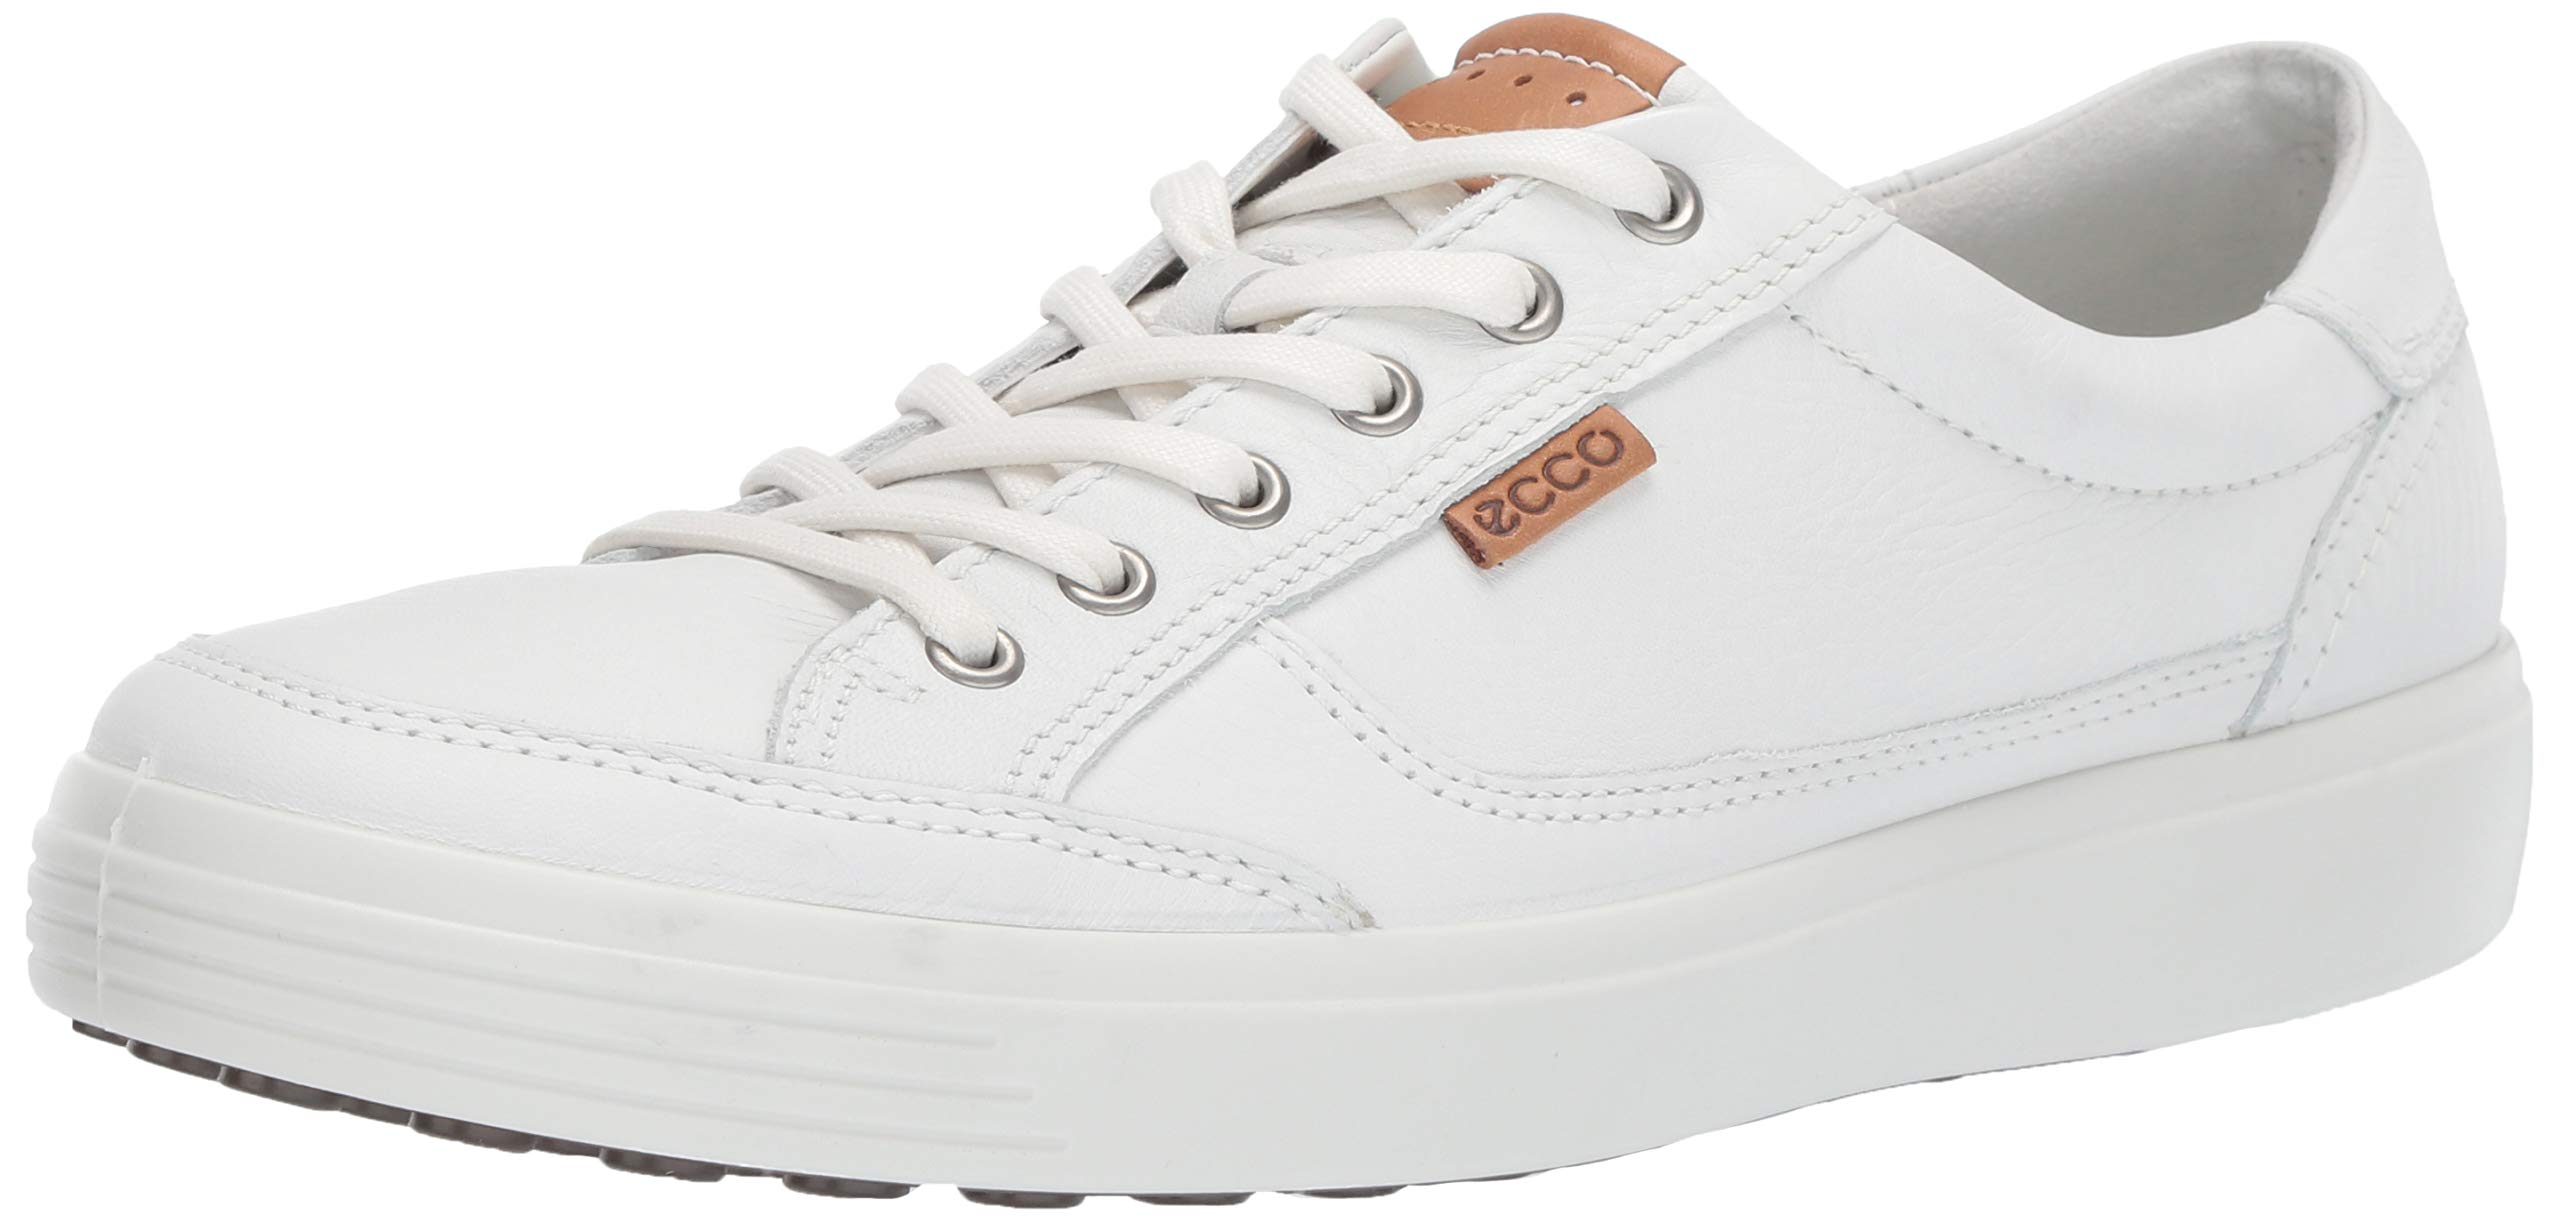 ECCO Men's Soft 7 Sneaker, White, 49 M EU (15-15.5 US)